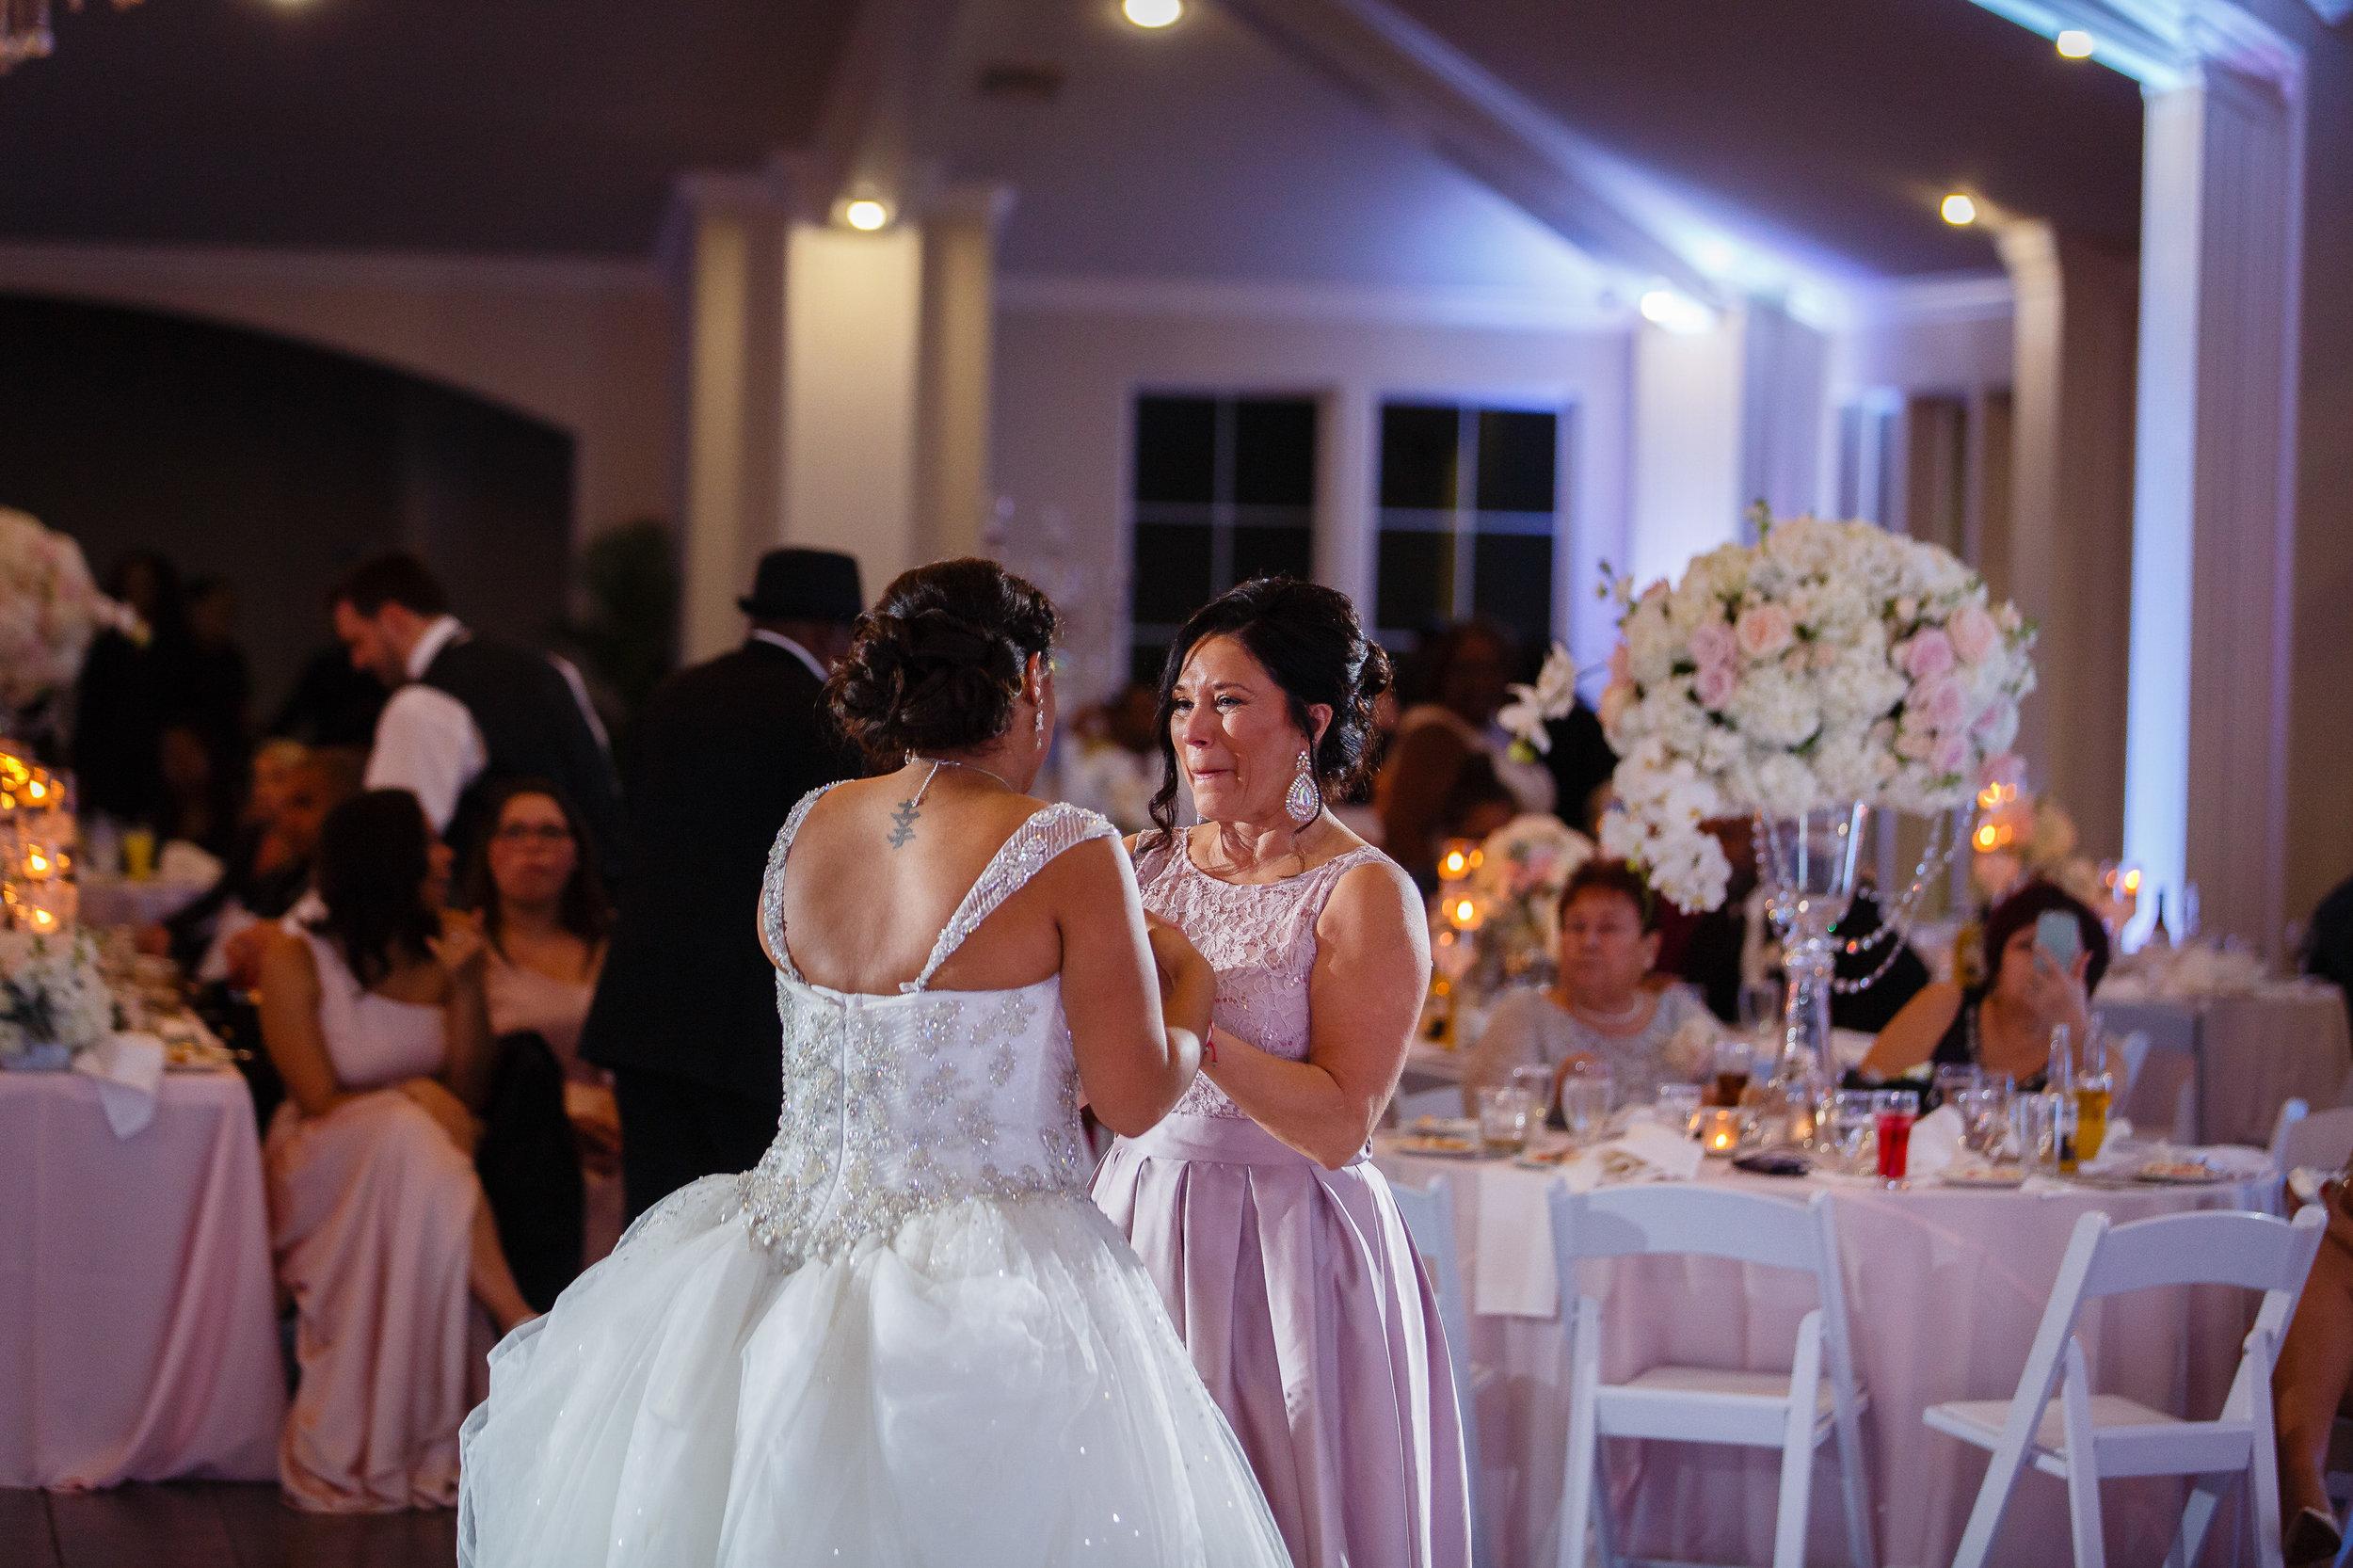 Dallas-wedding-planner-swank-soiree-fort-worth-weddingTLWed1217-687.jpg